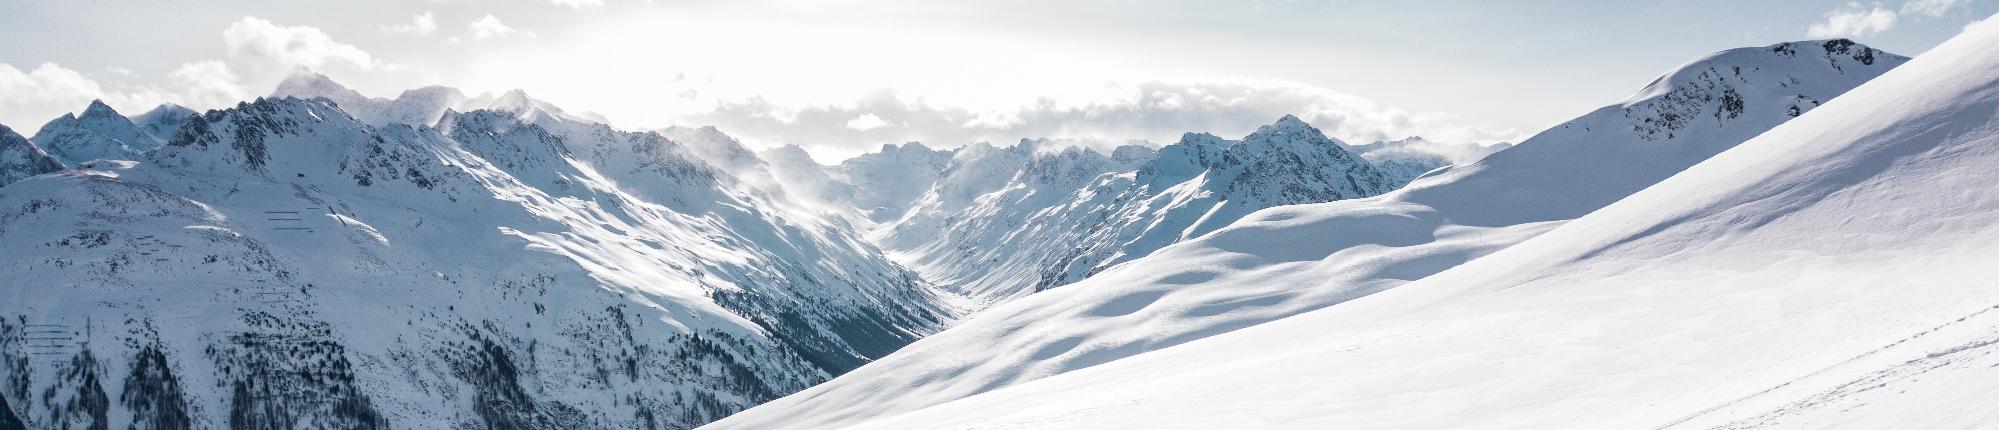 Jong Rabo ski trip 2020